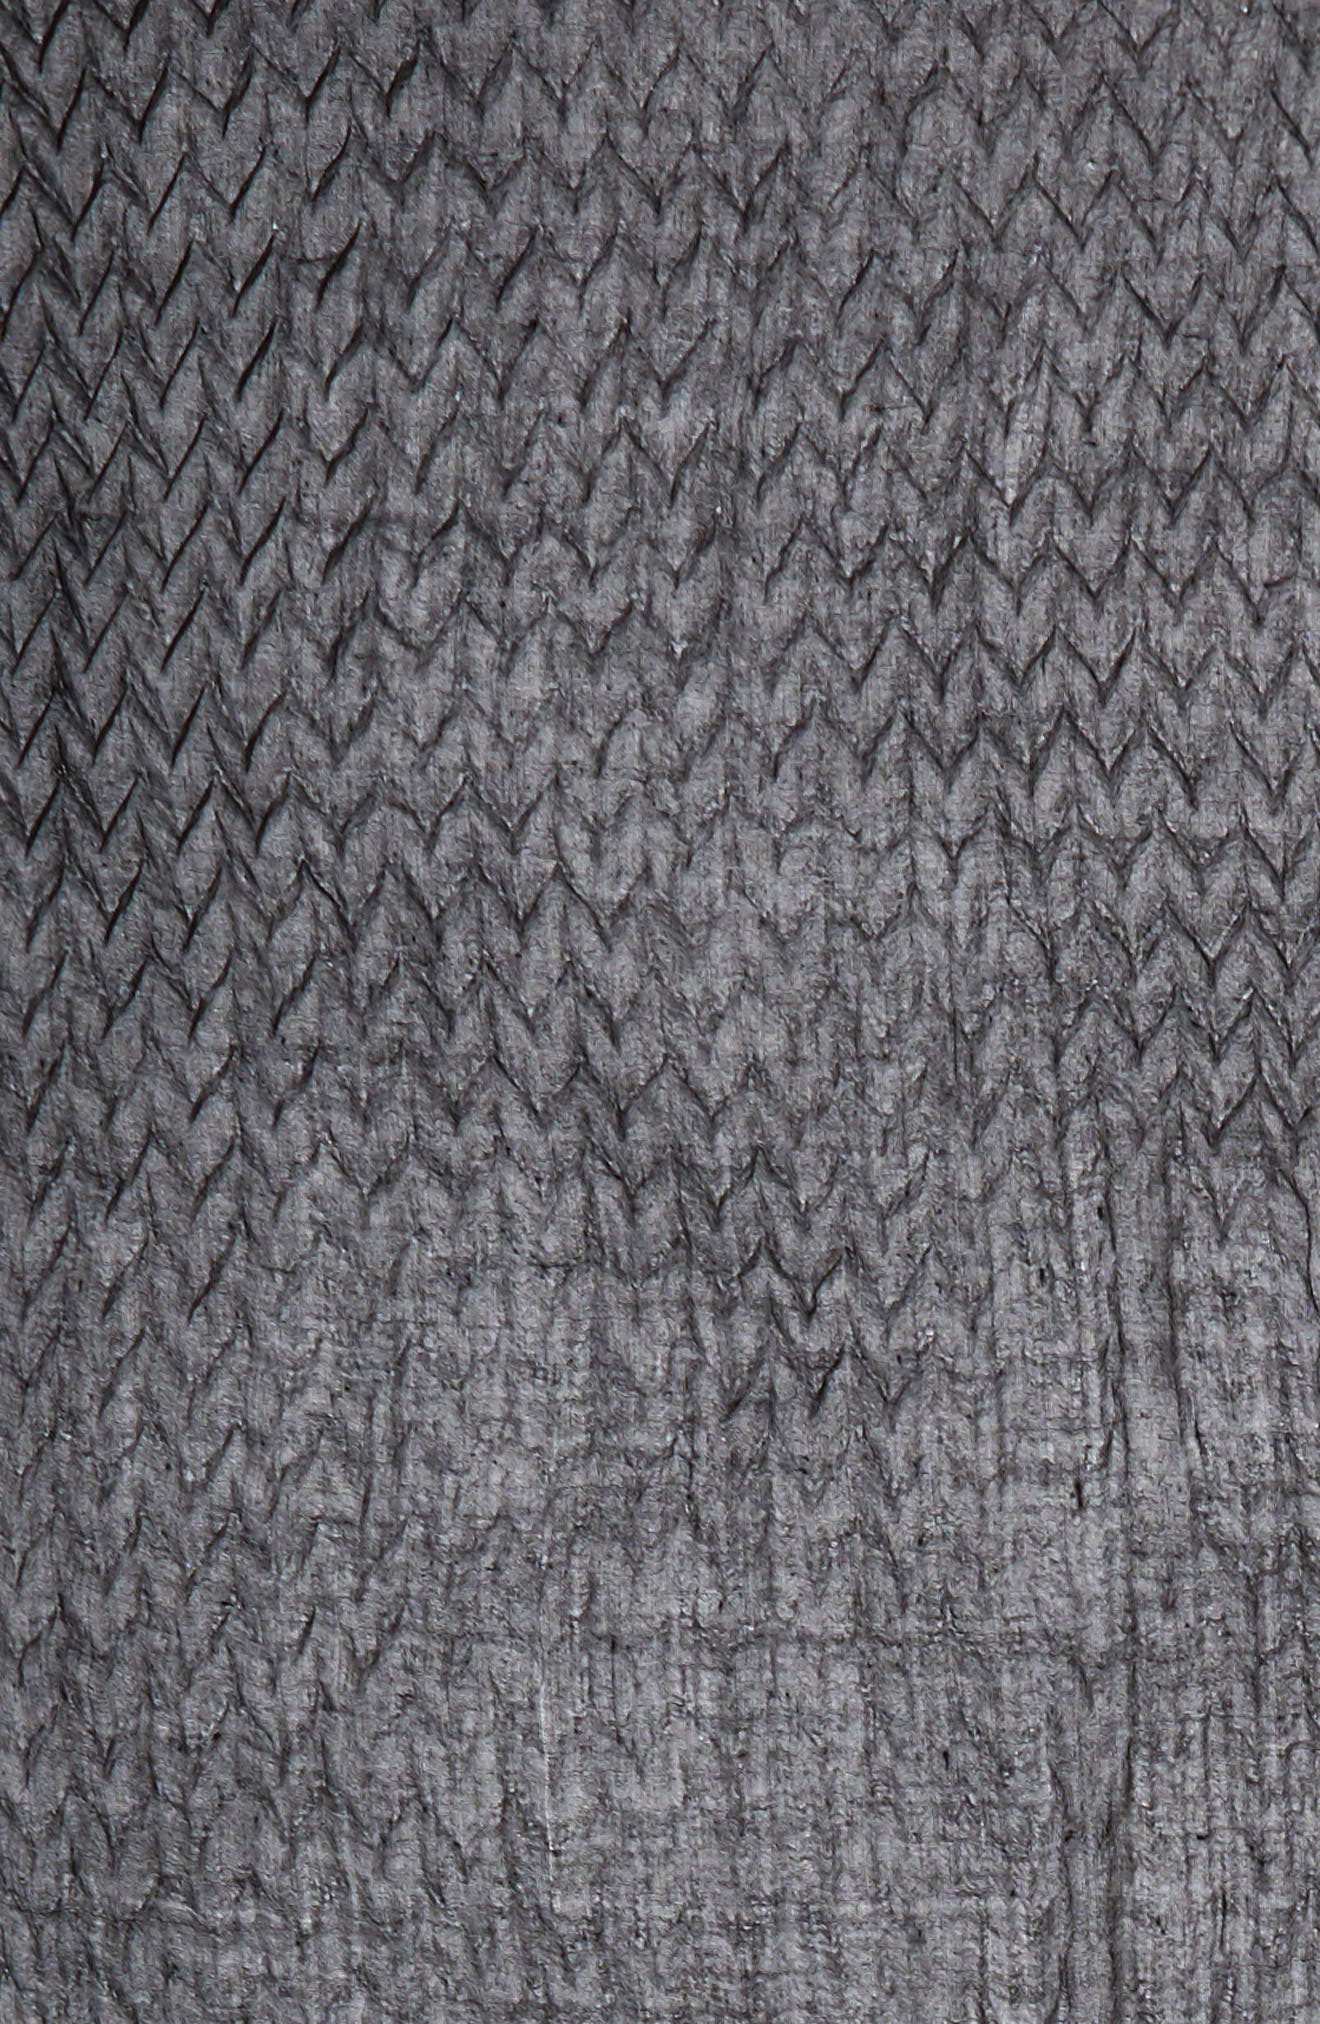 Silk & Wool Wrap,                             Alternate thumbnail 4, color,                             Black